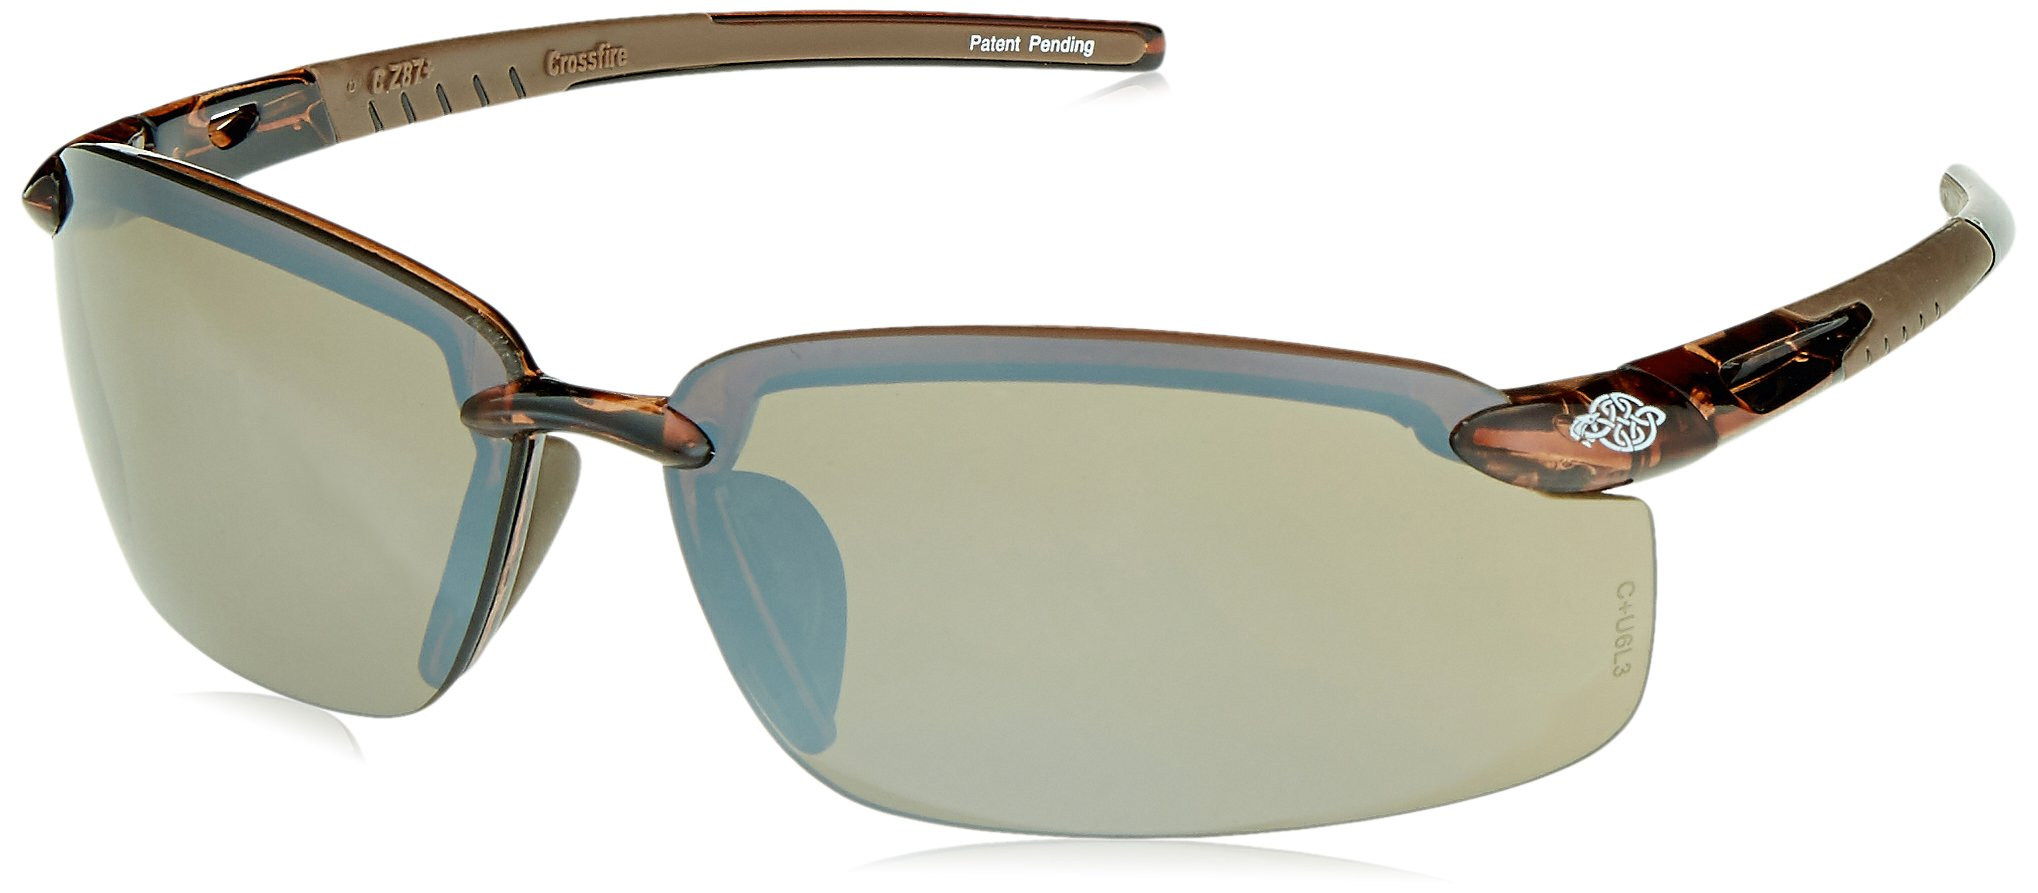 Crossfire 29117 ES5 Safety Glasses HD Brown Mirror Lens - Crystal Brown Frame